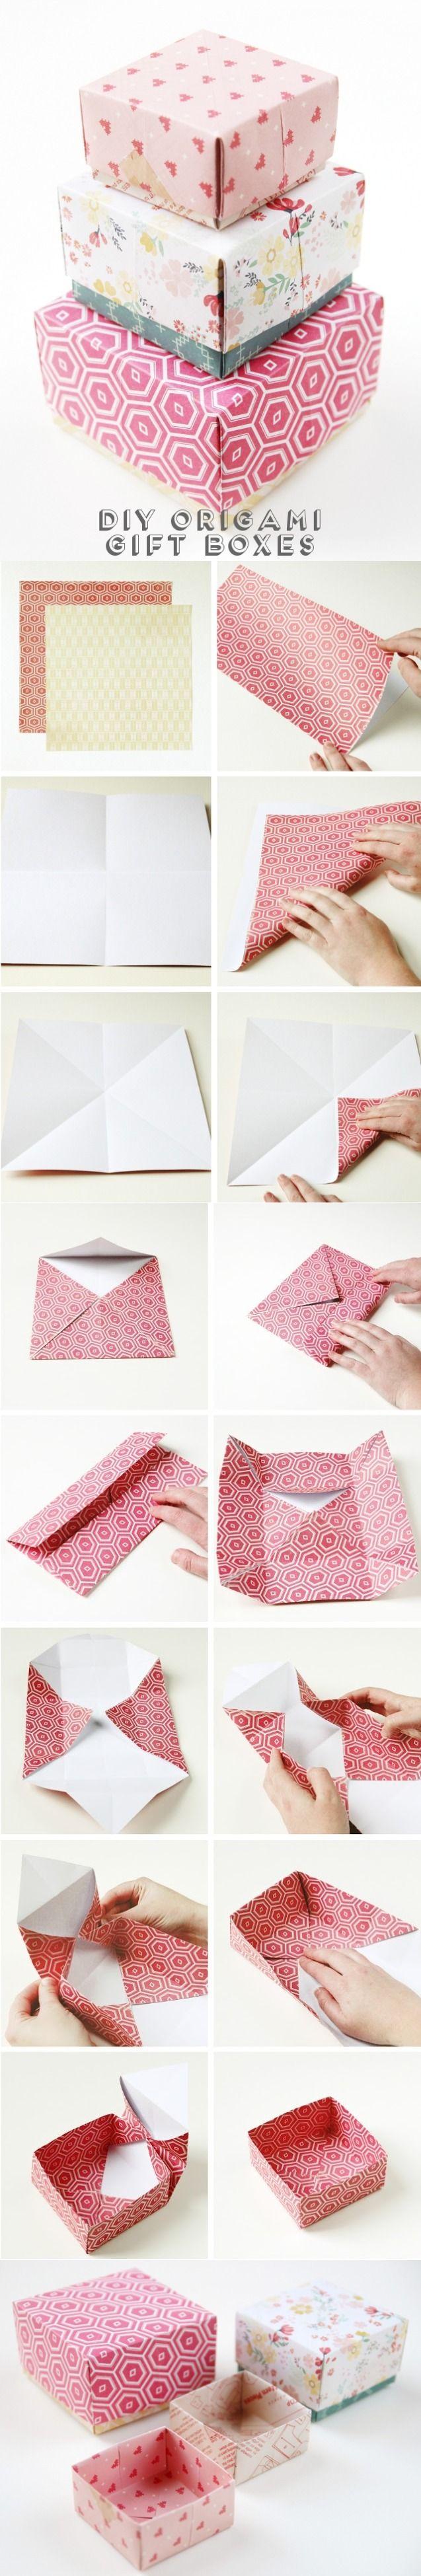 Delicadas Cajitas origami para envolver obsequios